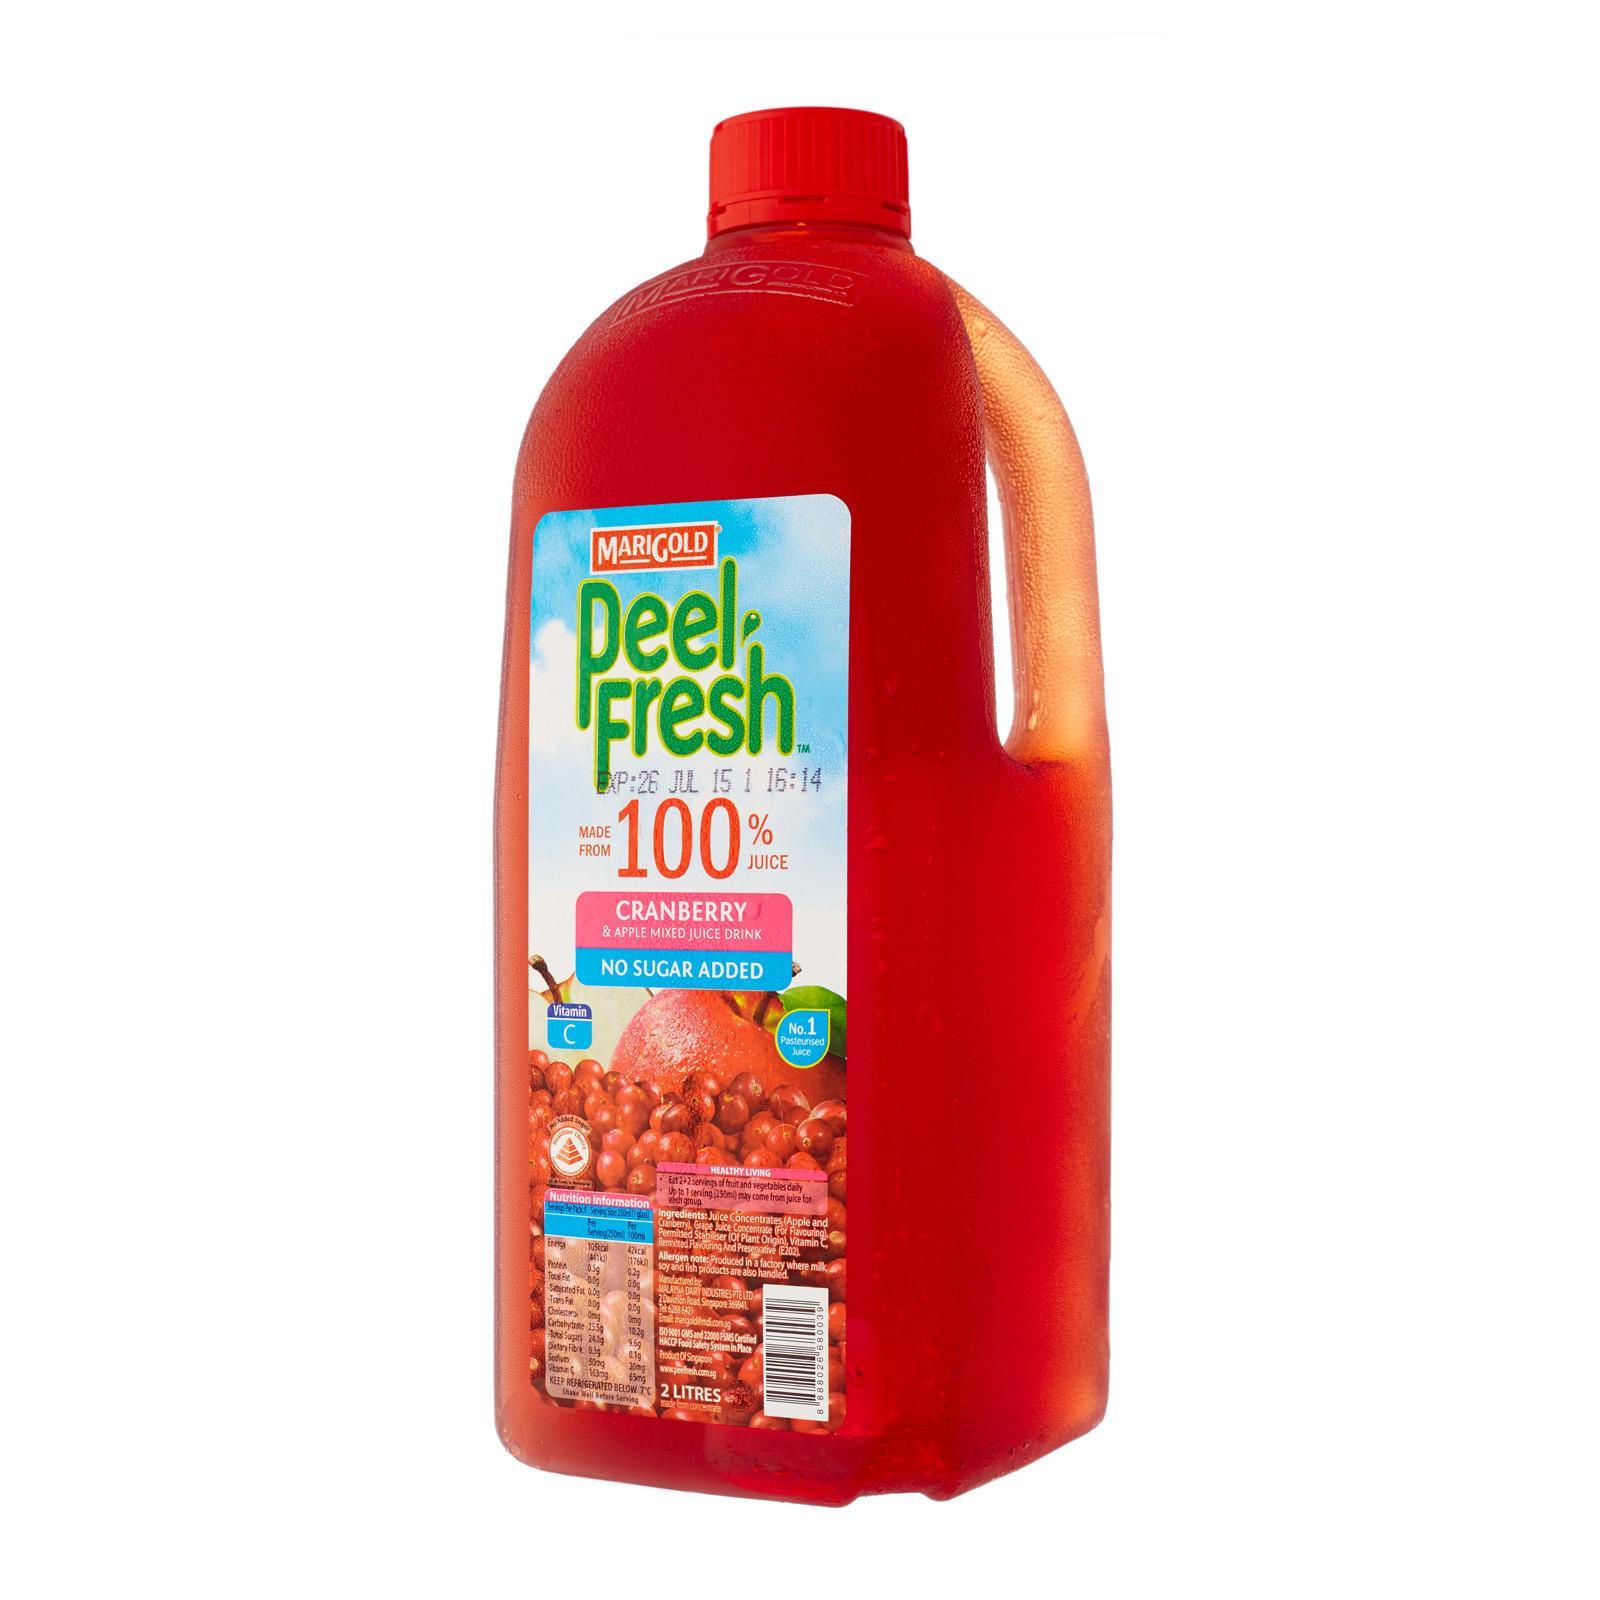 MARIGOLD Peel Fresh No Sugar Added Juice Drink - Apple Cranberry